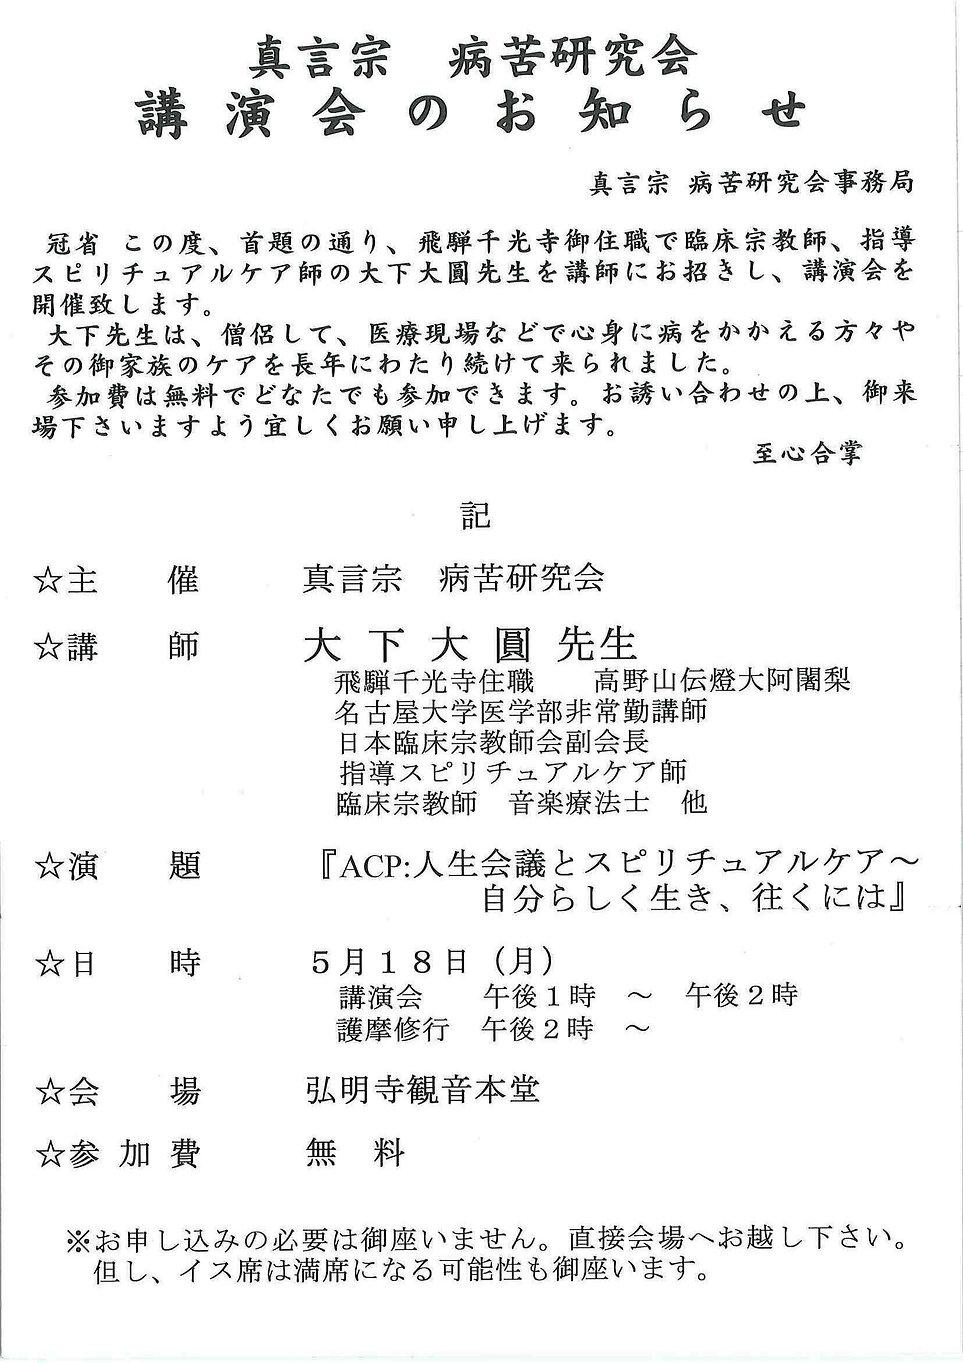 byoukukennkyuukai-2020-5-18-1.jpg